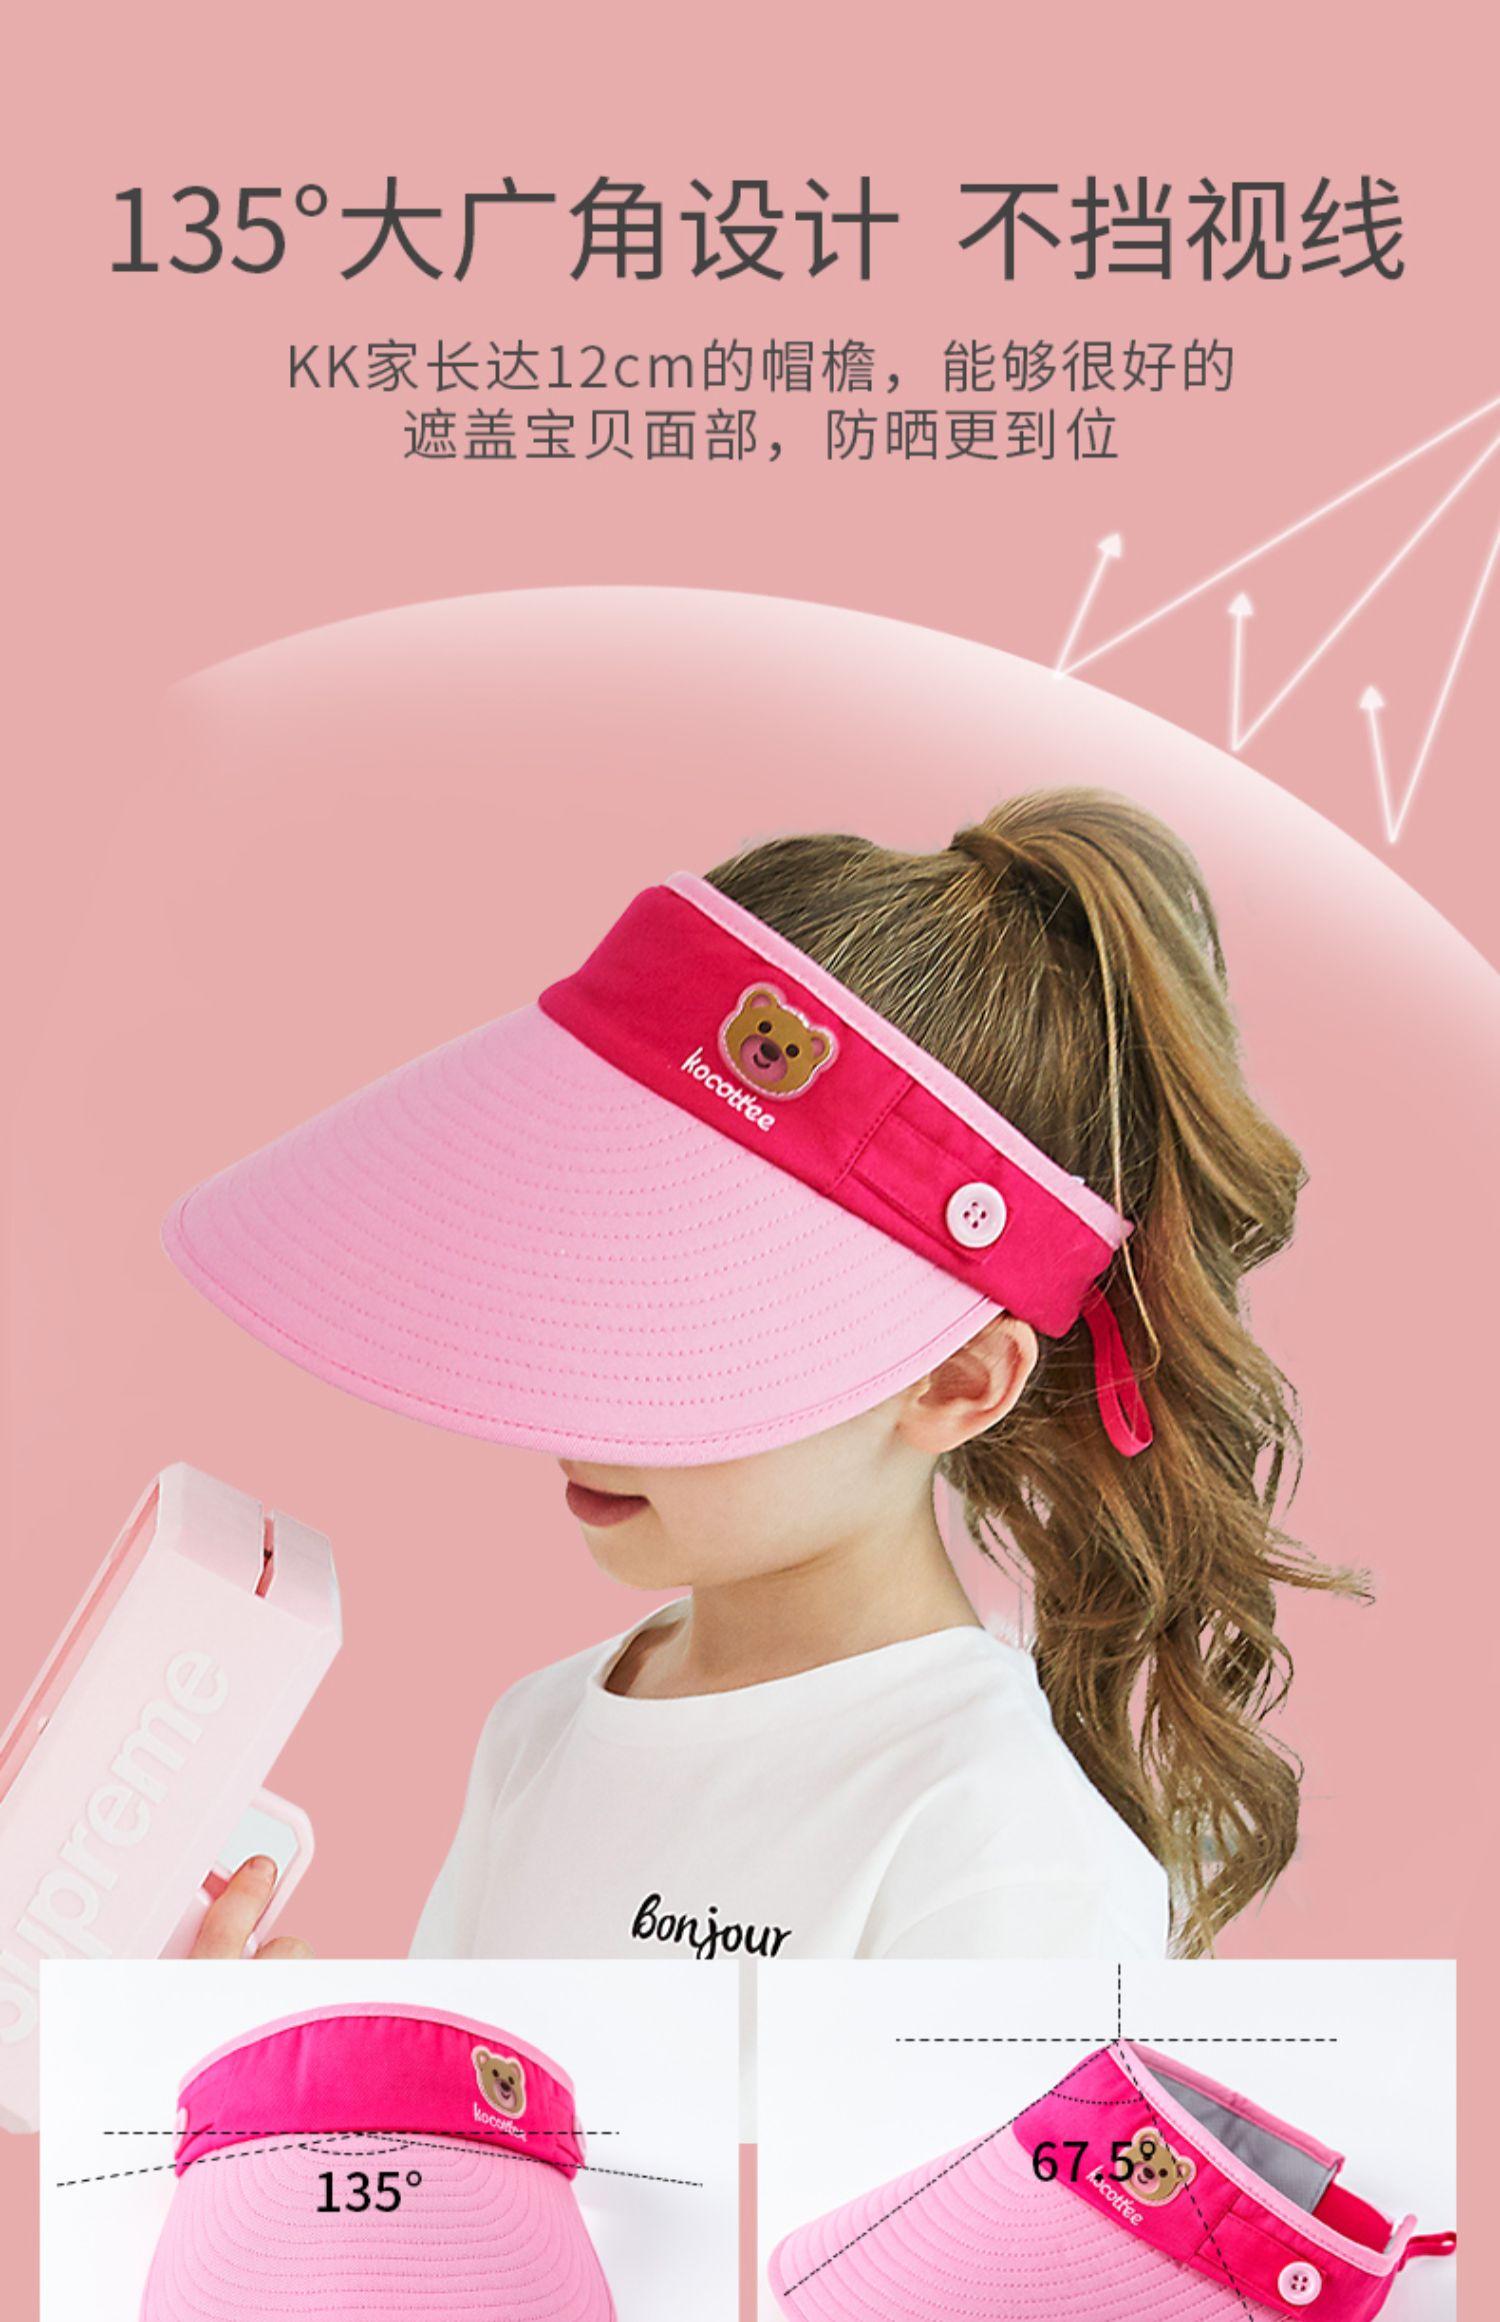 【kk树】儿童夏季防晒遮阳帽